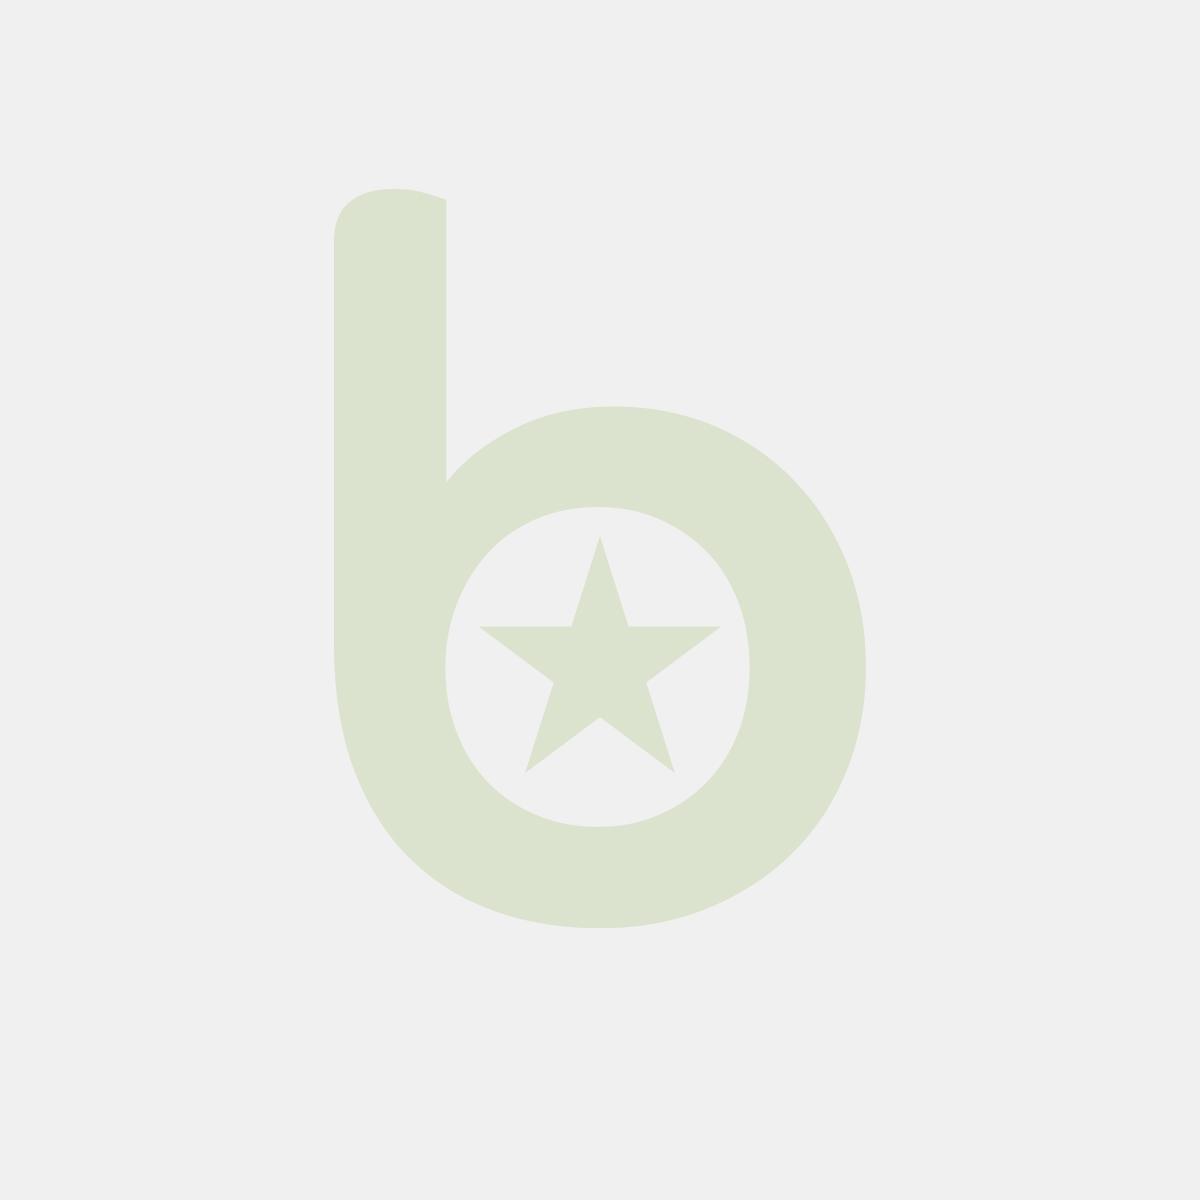 Taca prostokątna 16x26x1,5cm GN1/4 czarna z melaminy